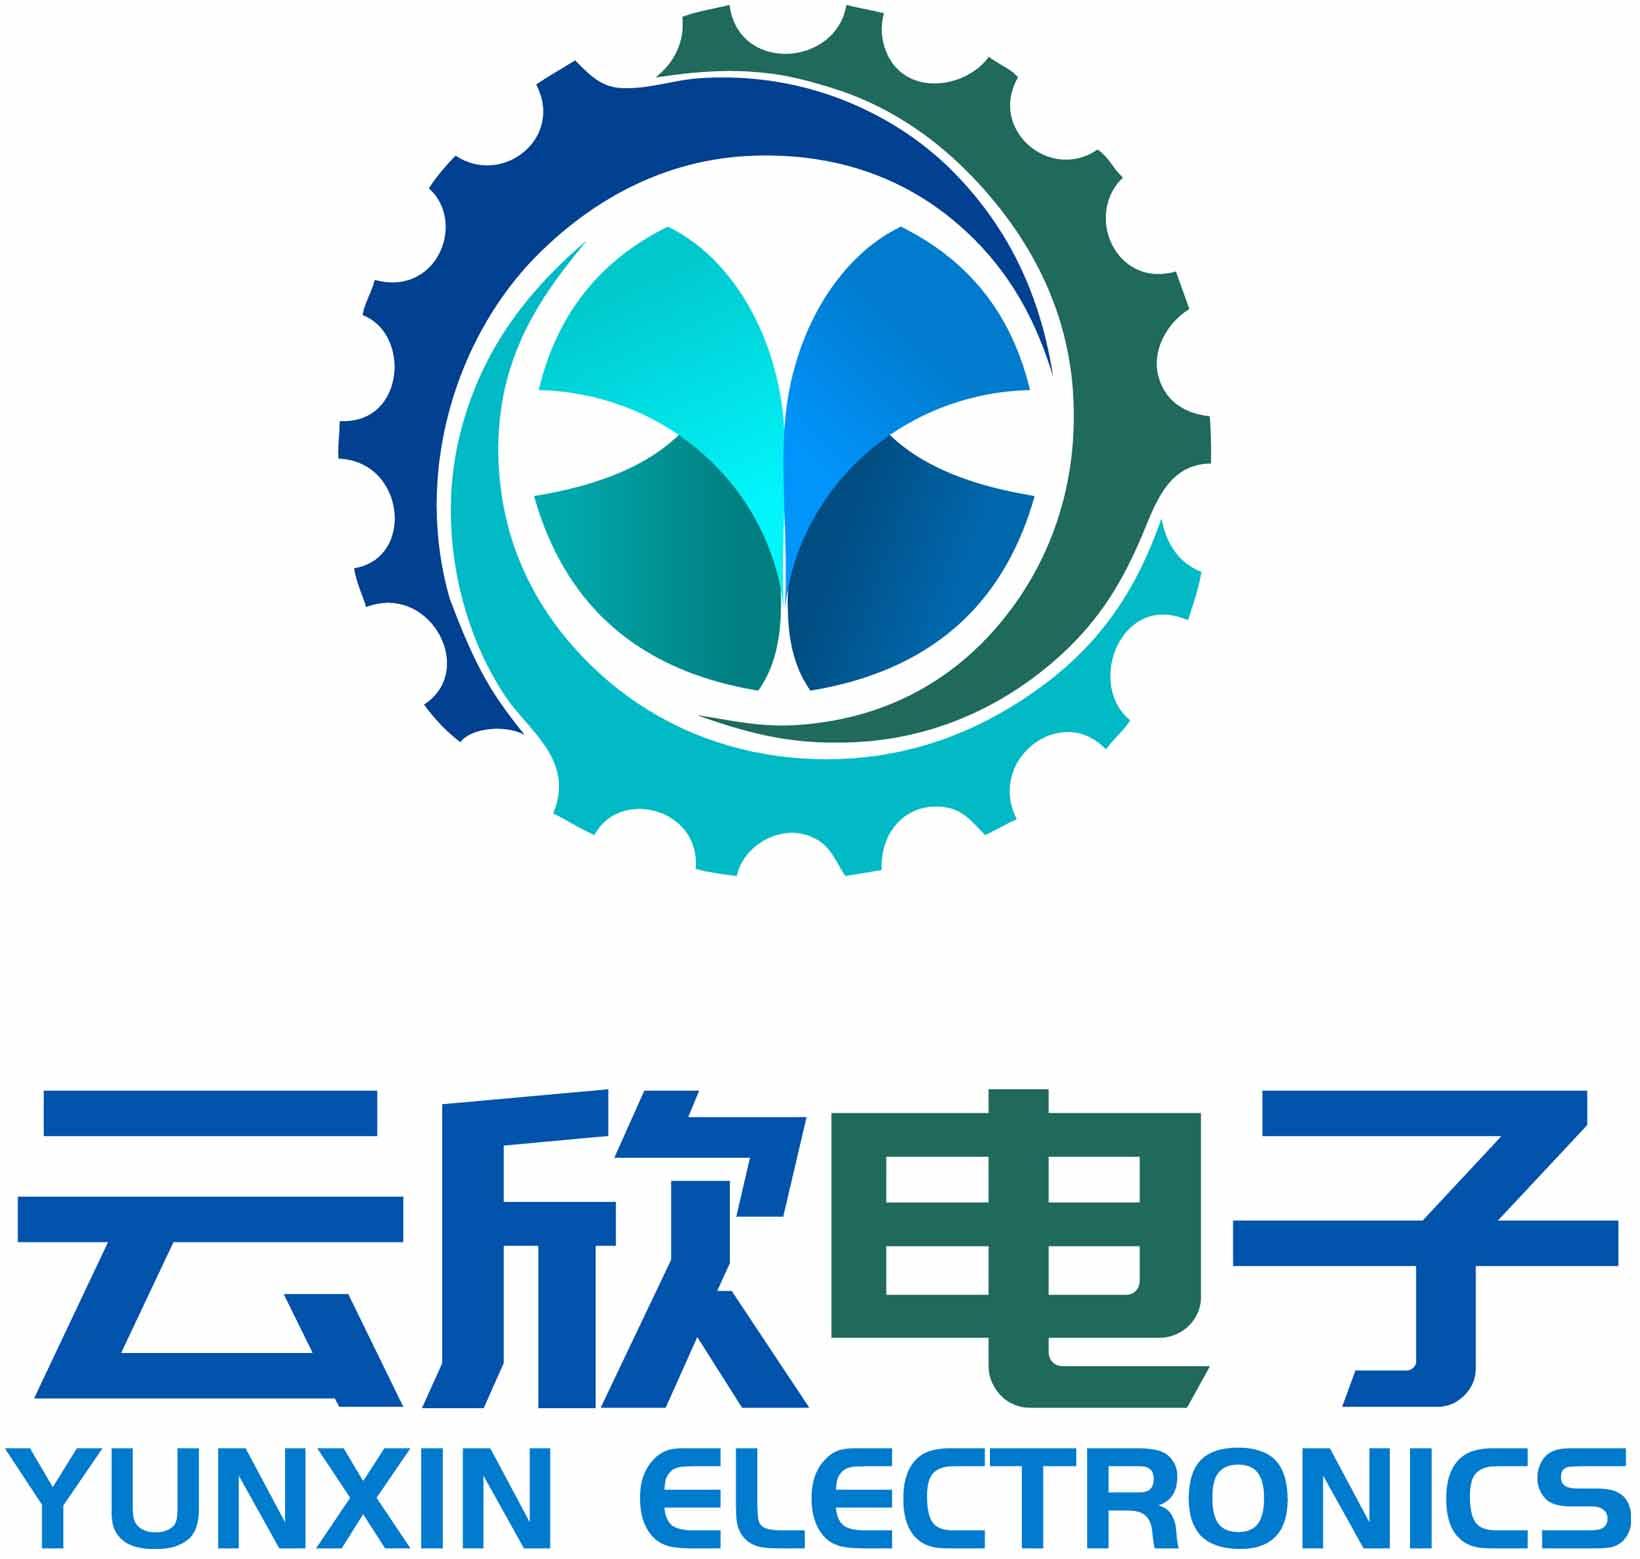 https://static.bjx.com.cn/company-logo/2018/06/20/2018062011240147_516842.jpg?x-oss-process=image/resize,w_130,h_130